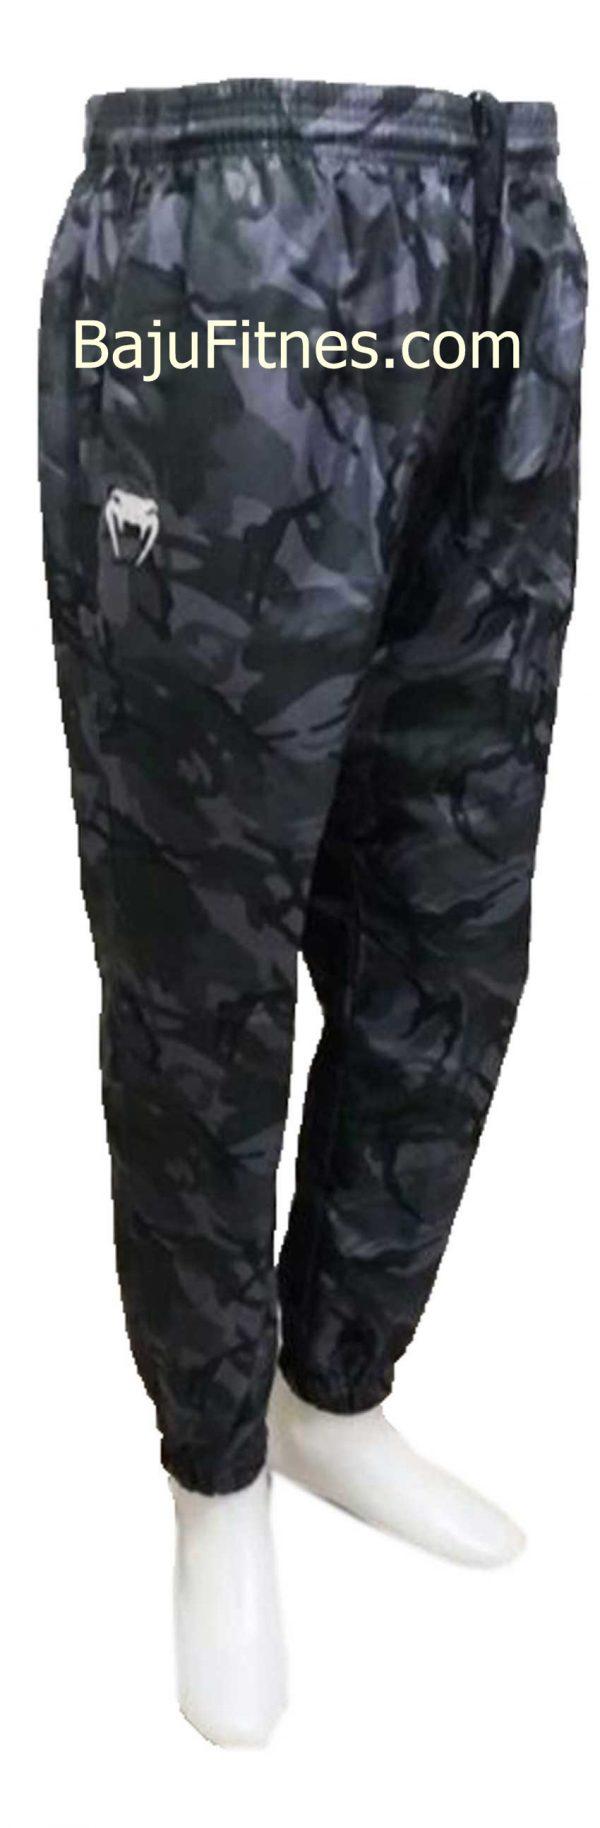 089506541896 Tri | 4112 Model Celana Body Combat Pria Mma